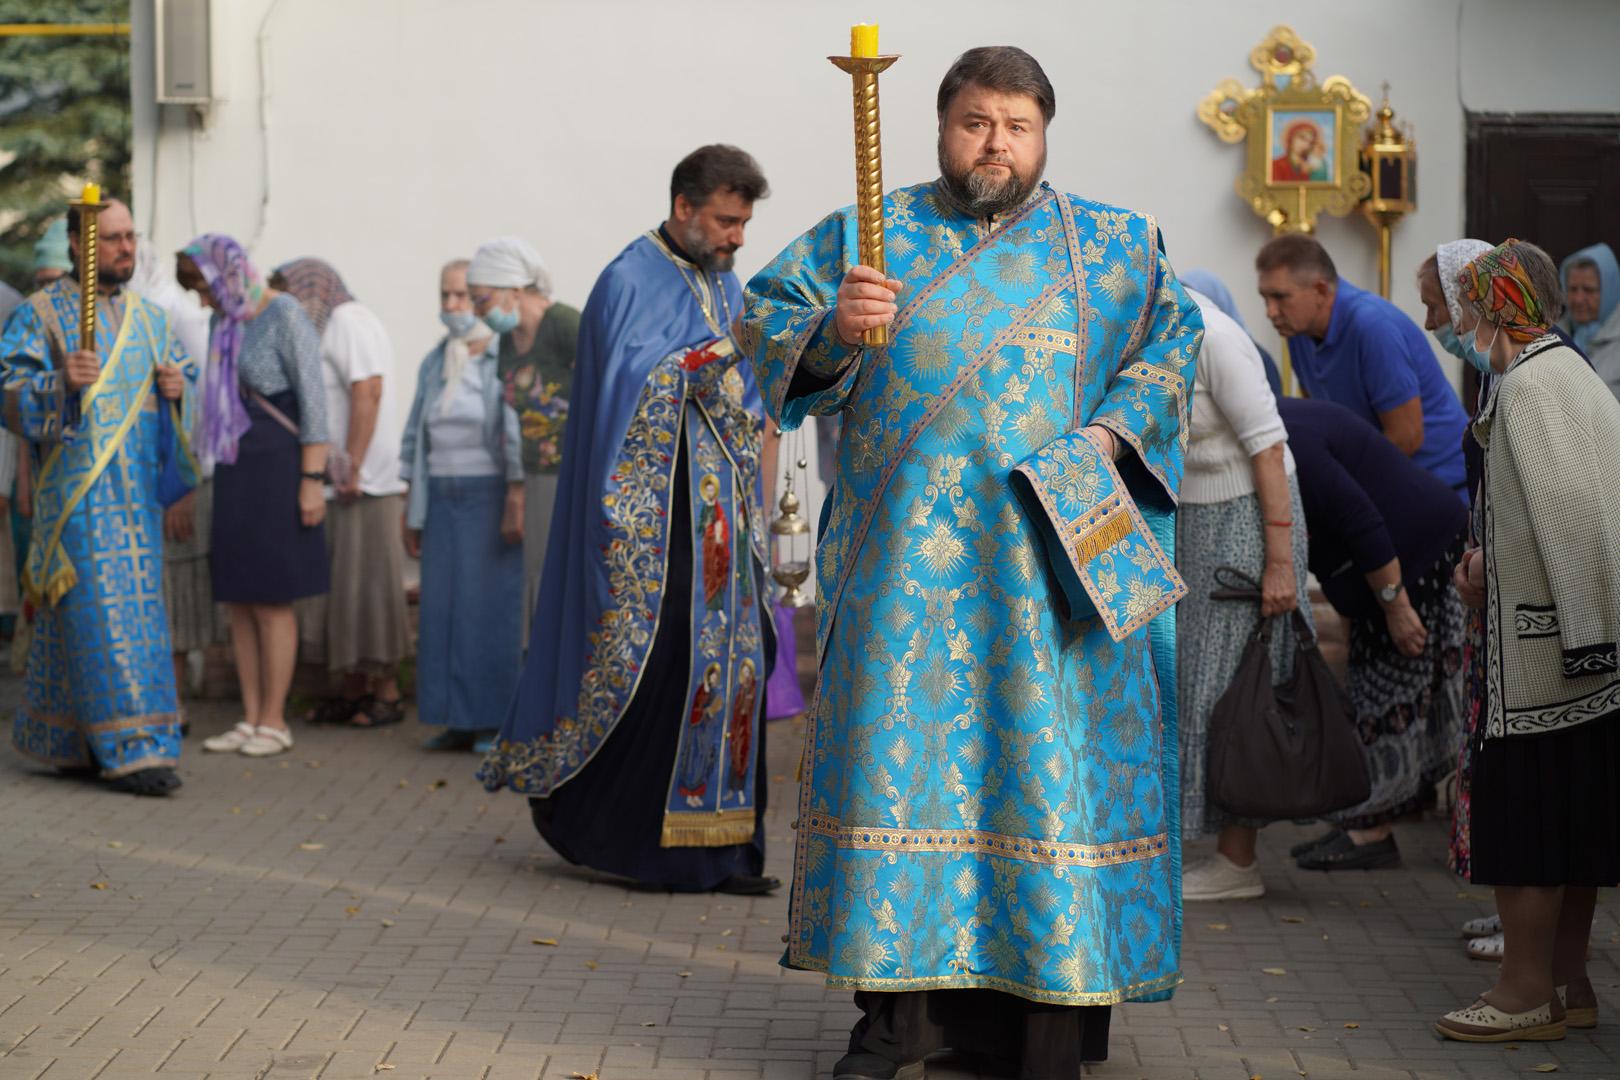 http://monuspen.ru/photoreports/eb9de00e1f5615849ea00b127bfcb98l.jpg